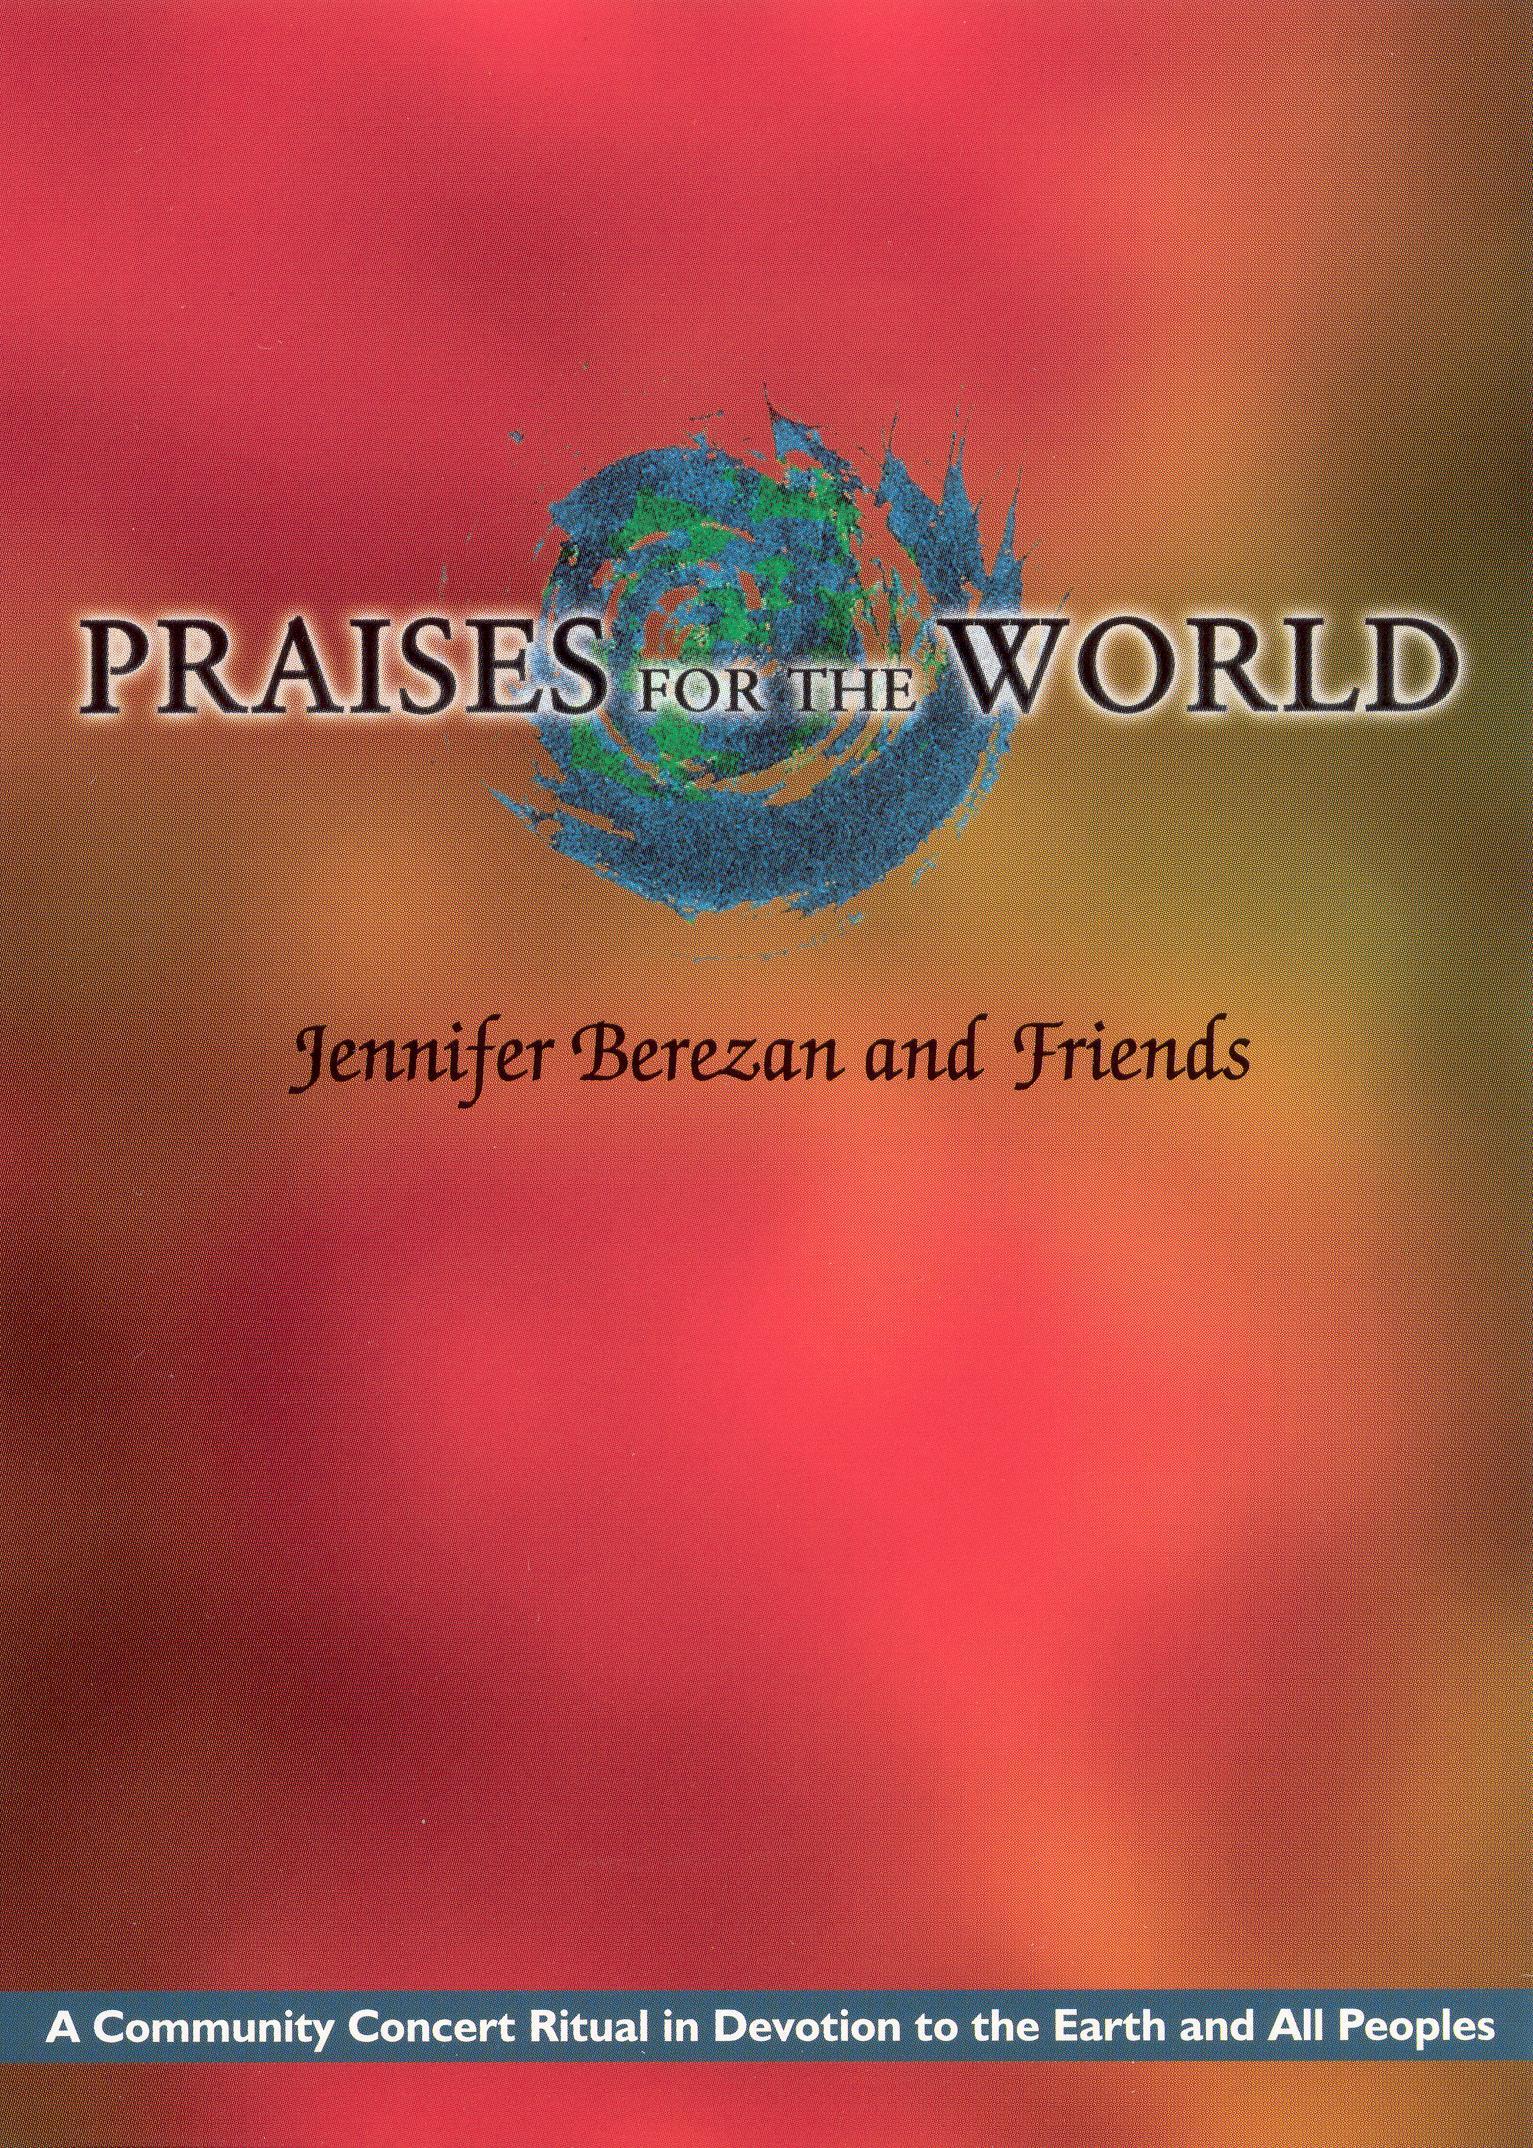 Jennifer Berezan and Friends: Praises For the World